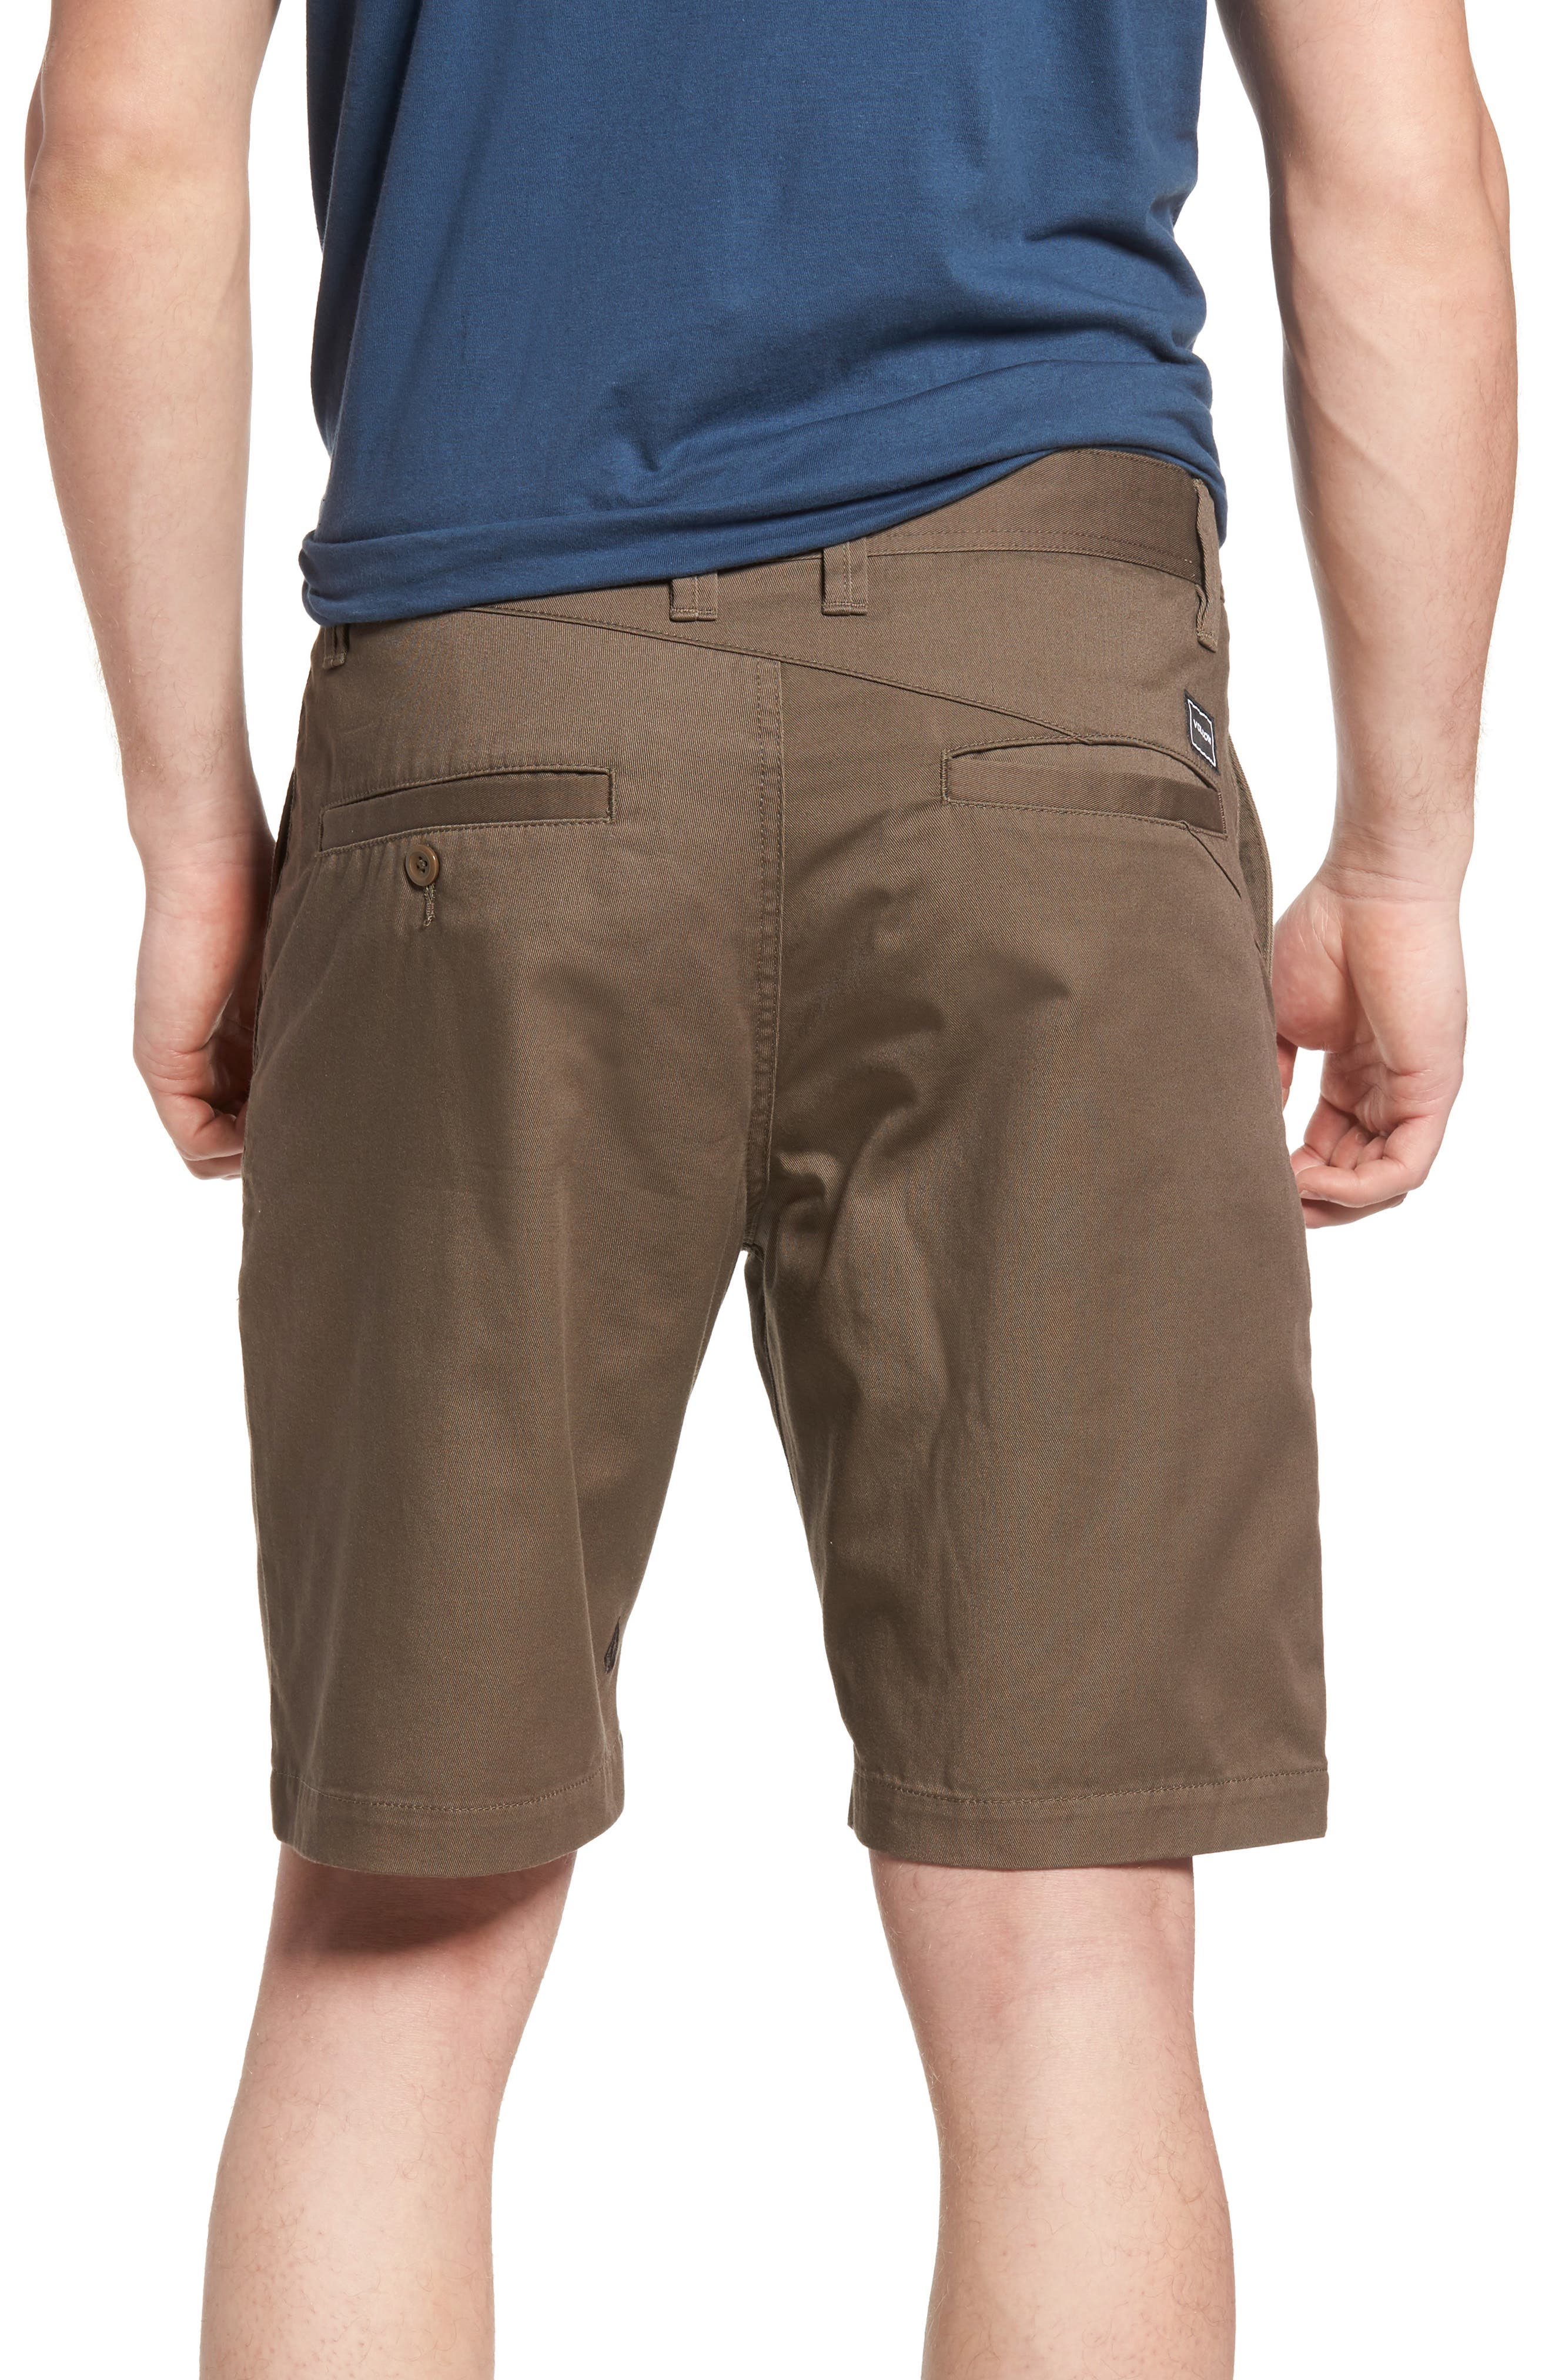 Drifter Modern Chino Shorts,                             Alternate thumbnail 2, color,                             Mushroom